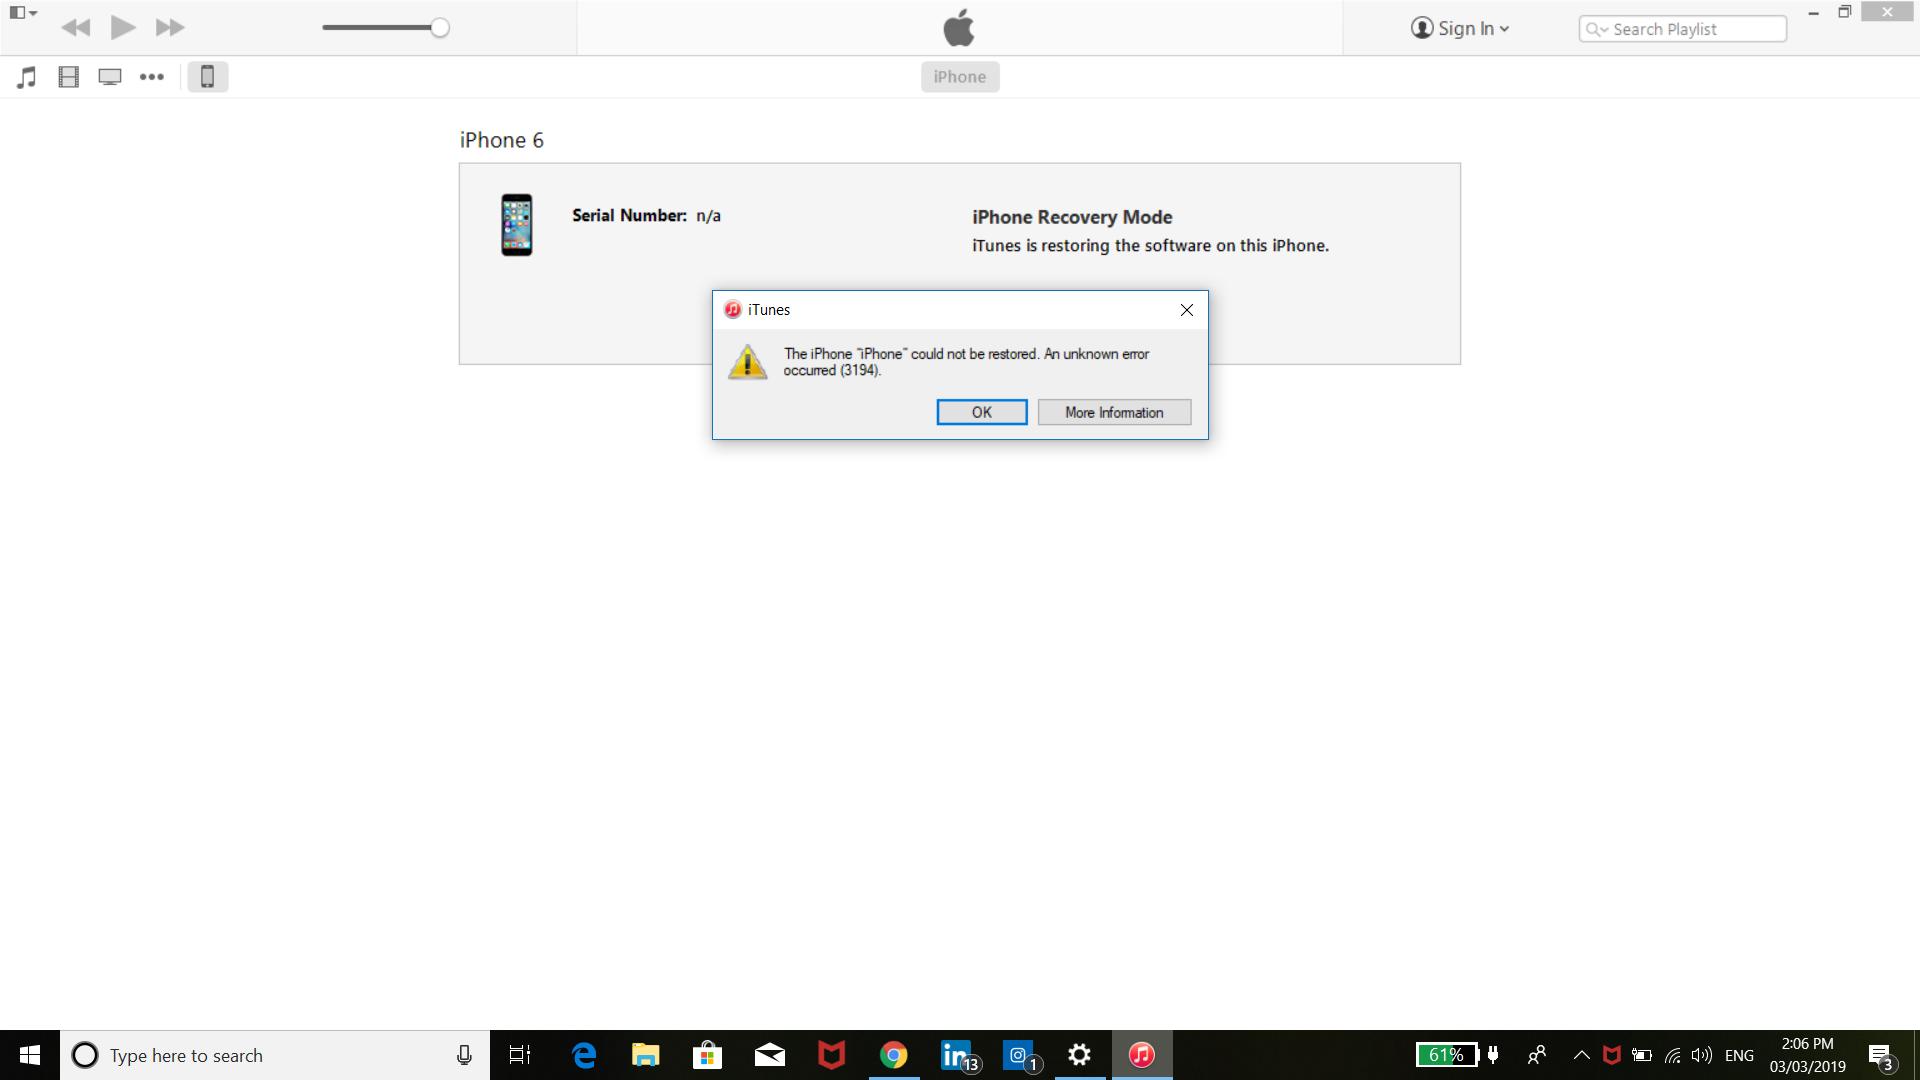 Iphone 6 restart - Apple Community